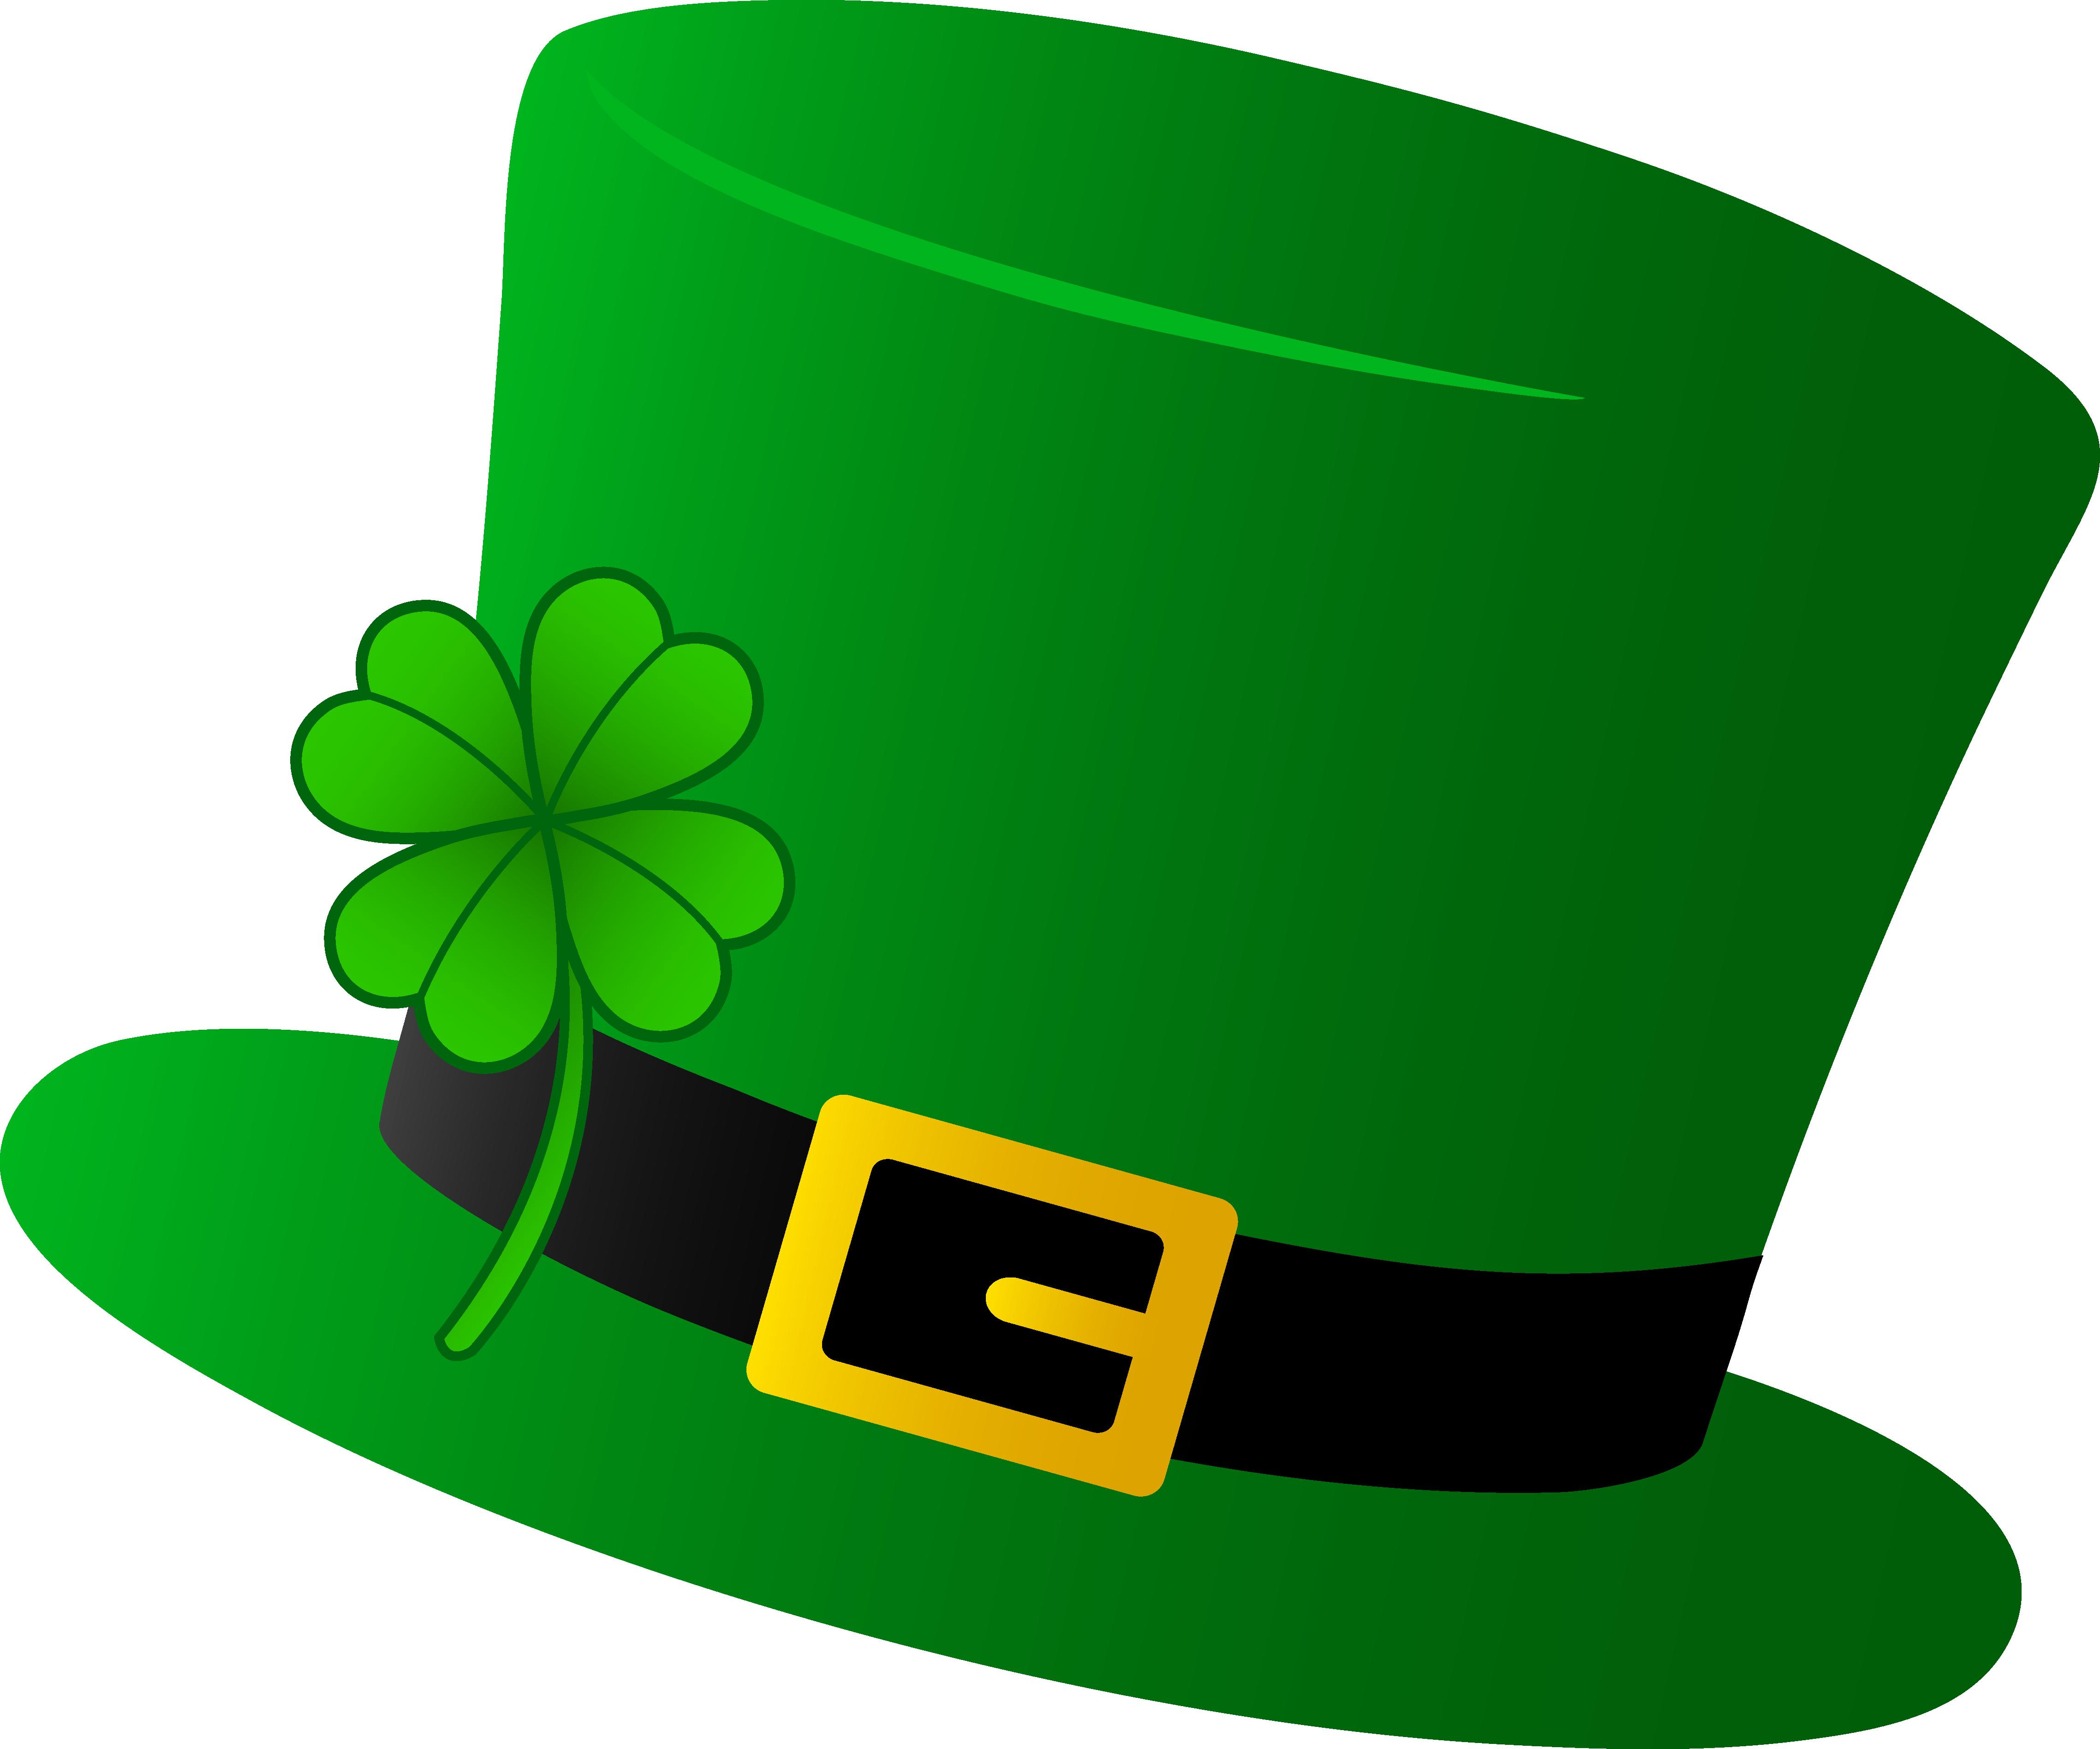 4552x3791 Latest Irish Shamrock Clipart St Patrick Day Shamrock Clipart